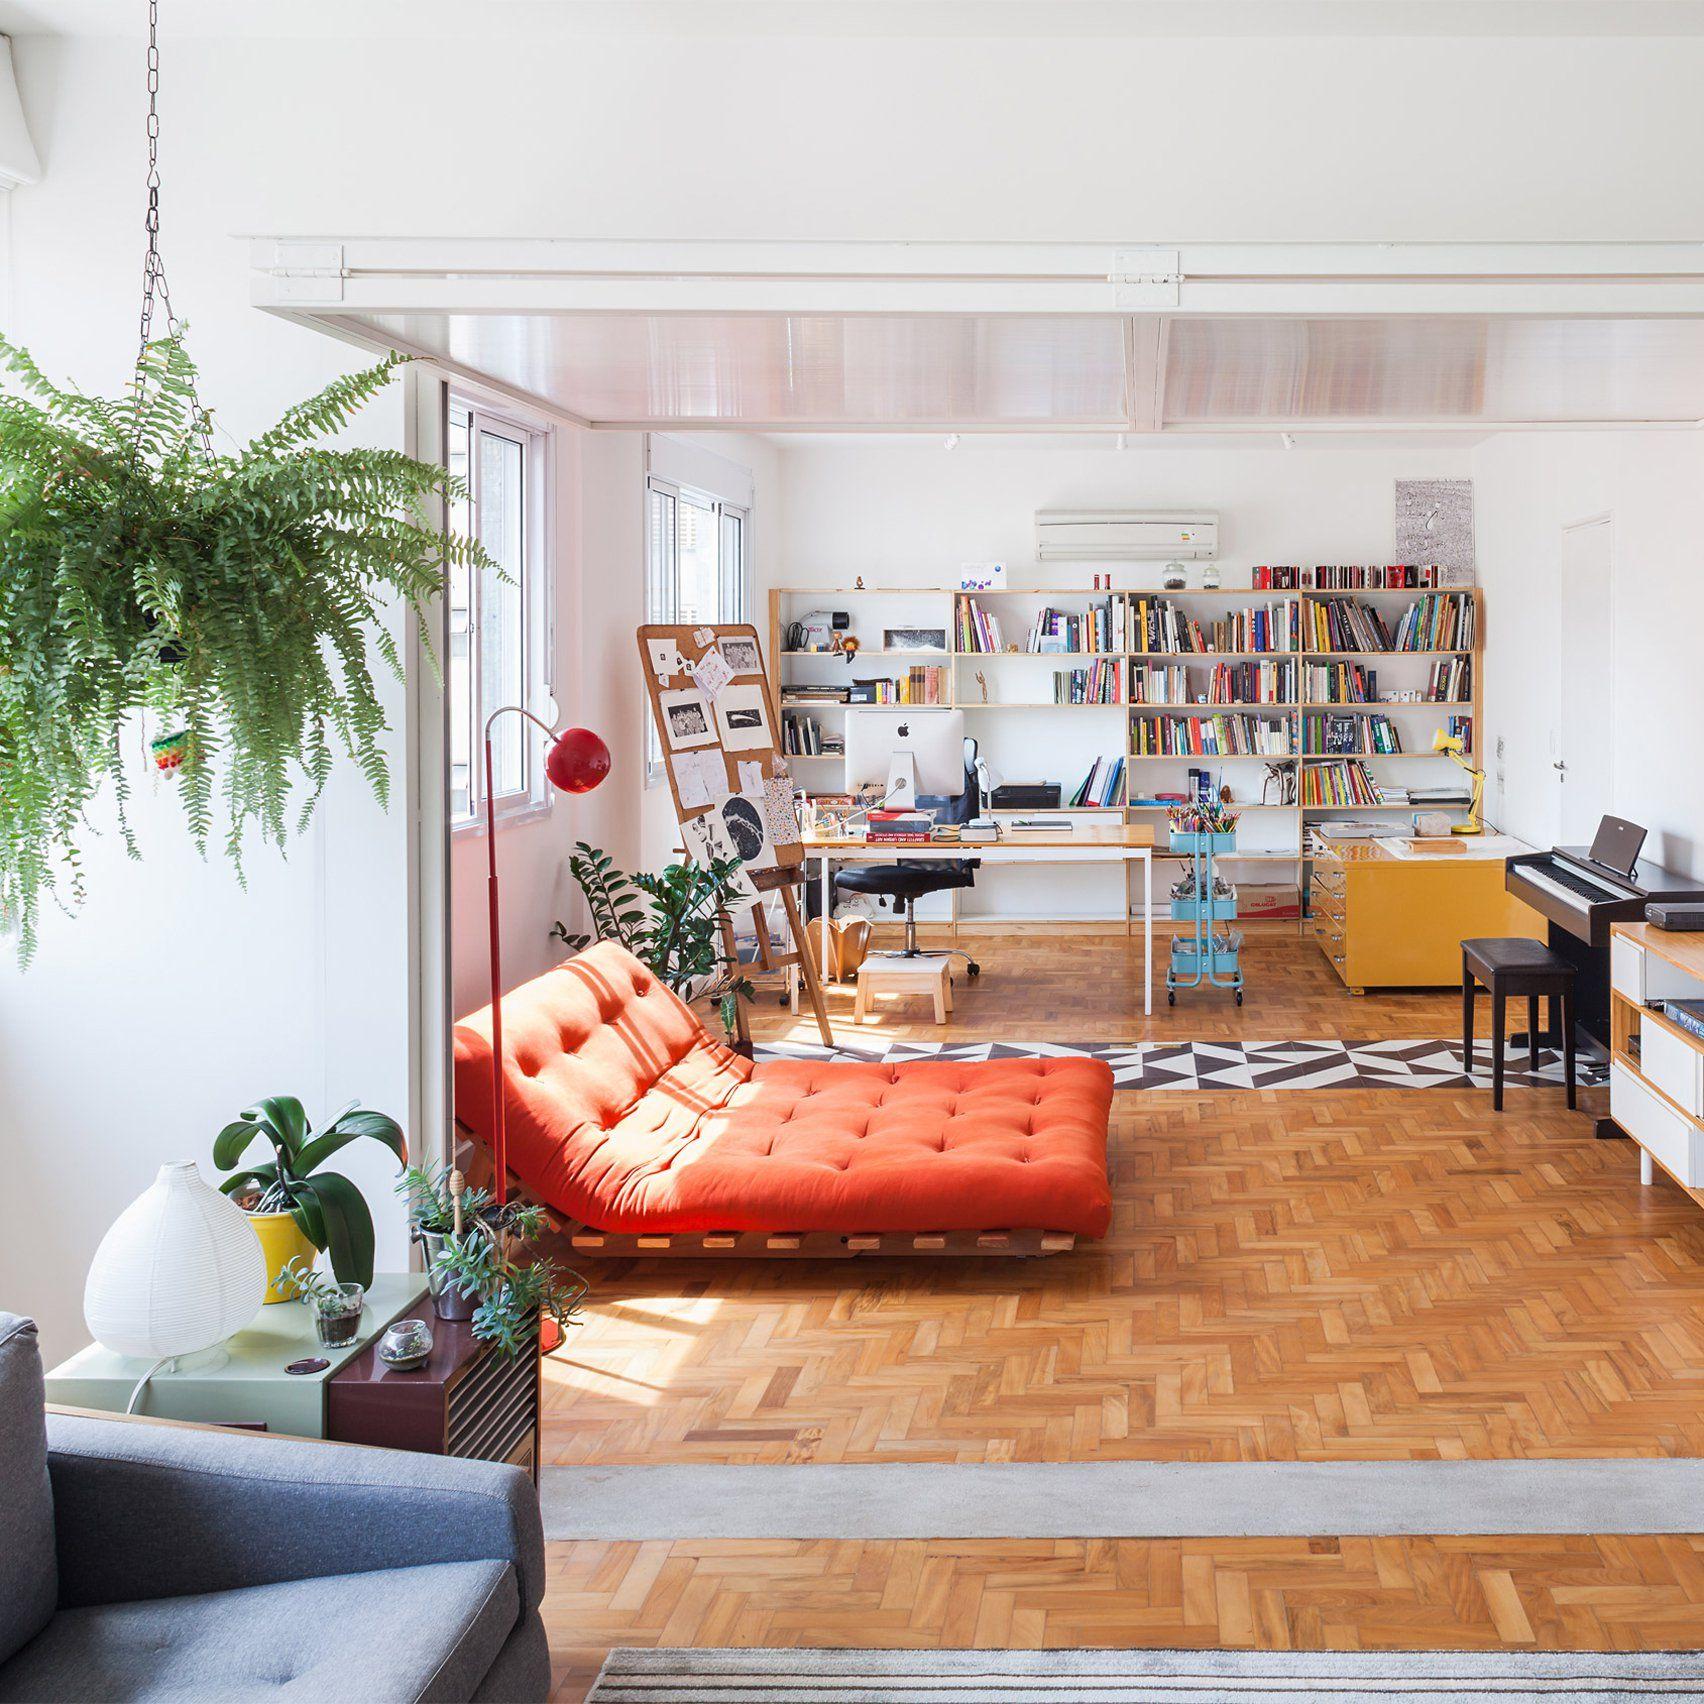 Marvelous 10 Retro Interiors Show The 70s Are Making A Comeback